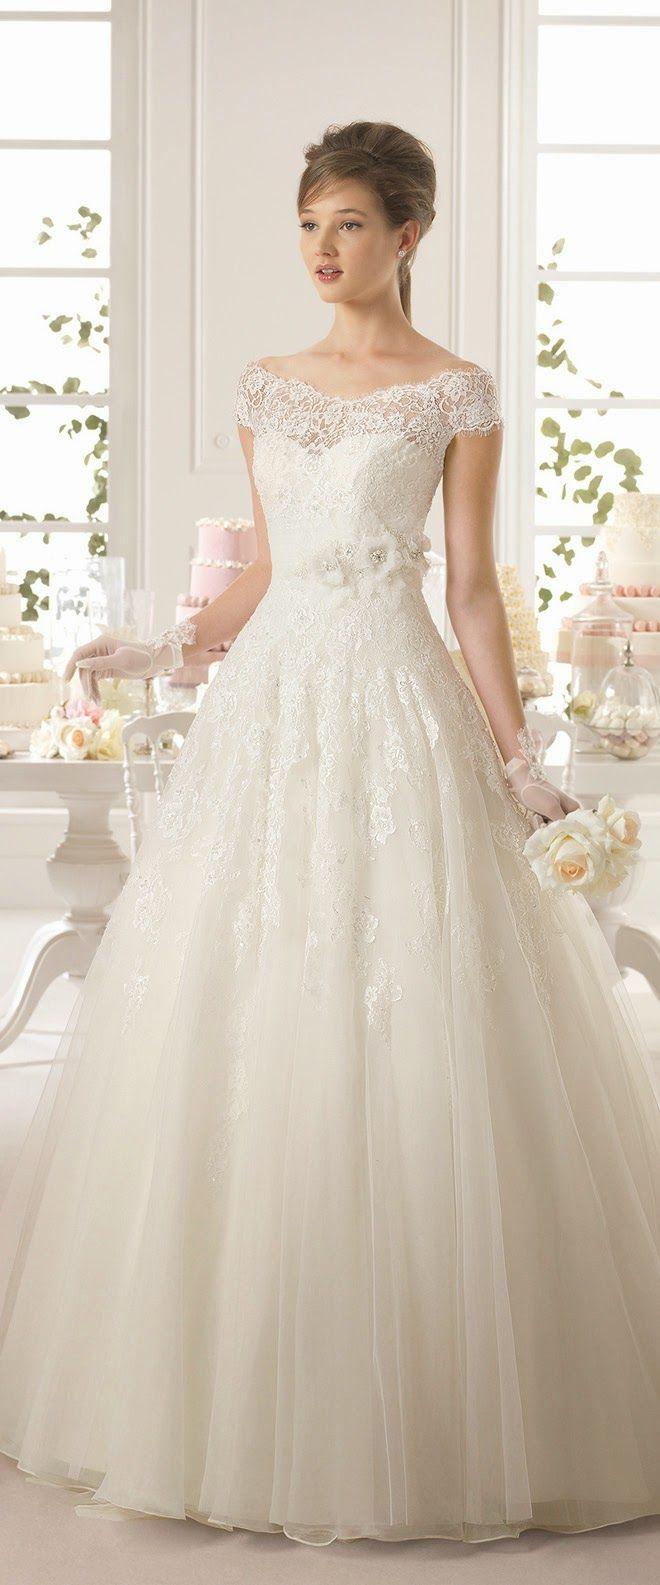 best gown wedding dress images on pinterest wedding frocks